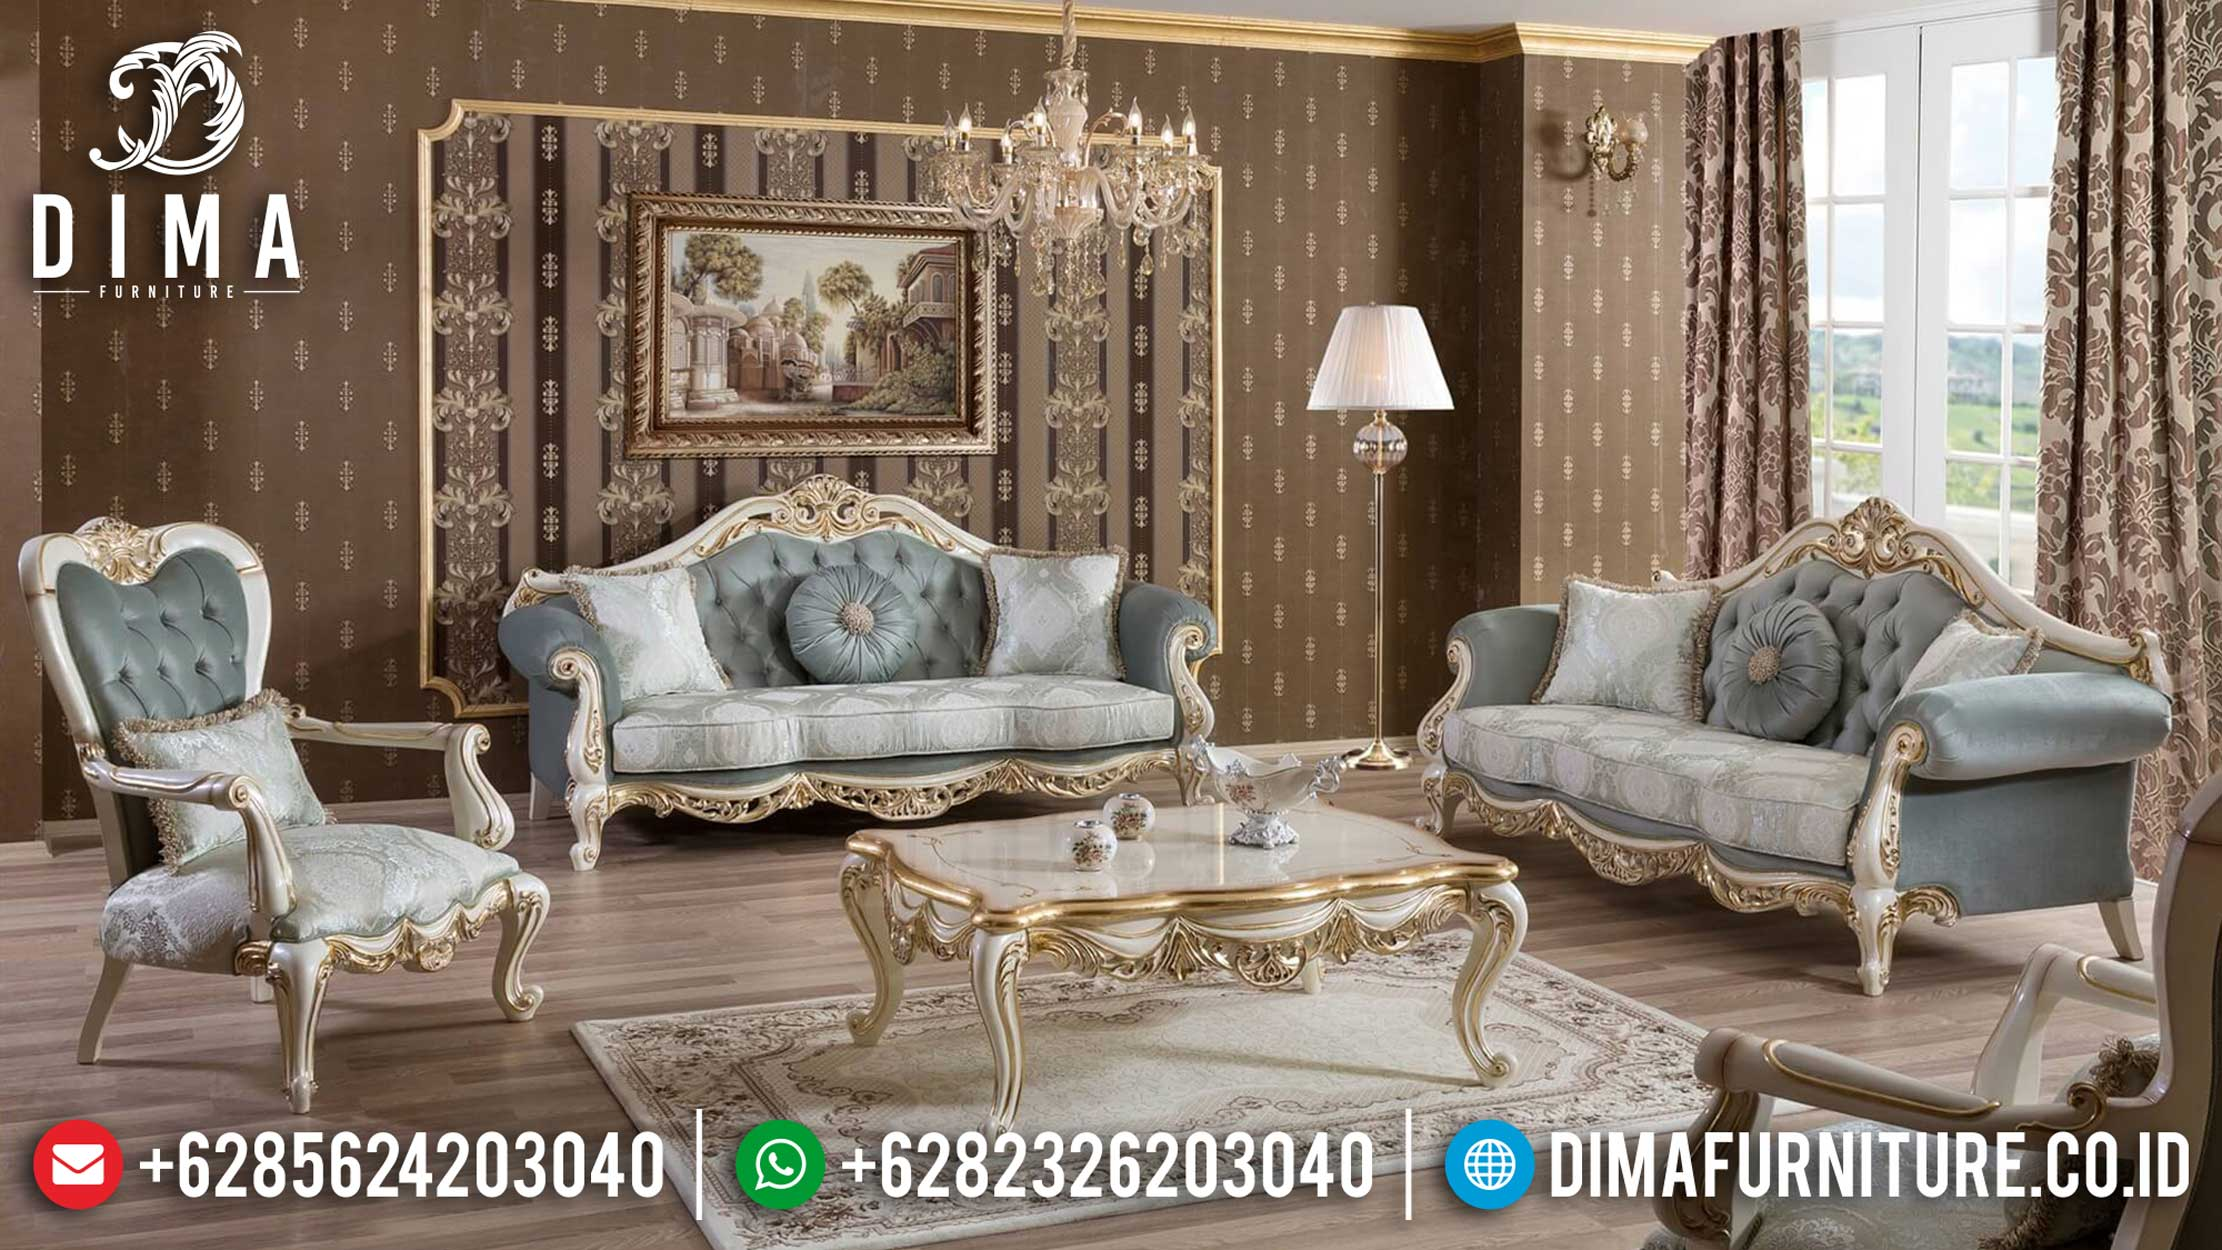 Sale On Weekend Sofa Tamu Mewah Jepara Harga Istimewa Beautiful Design TTJ-1068